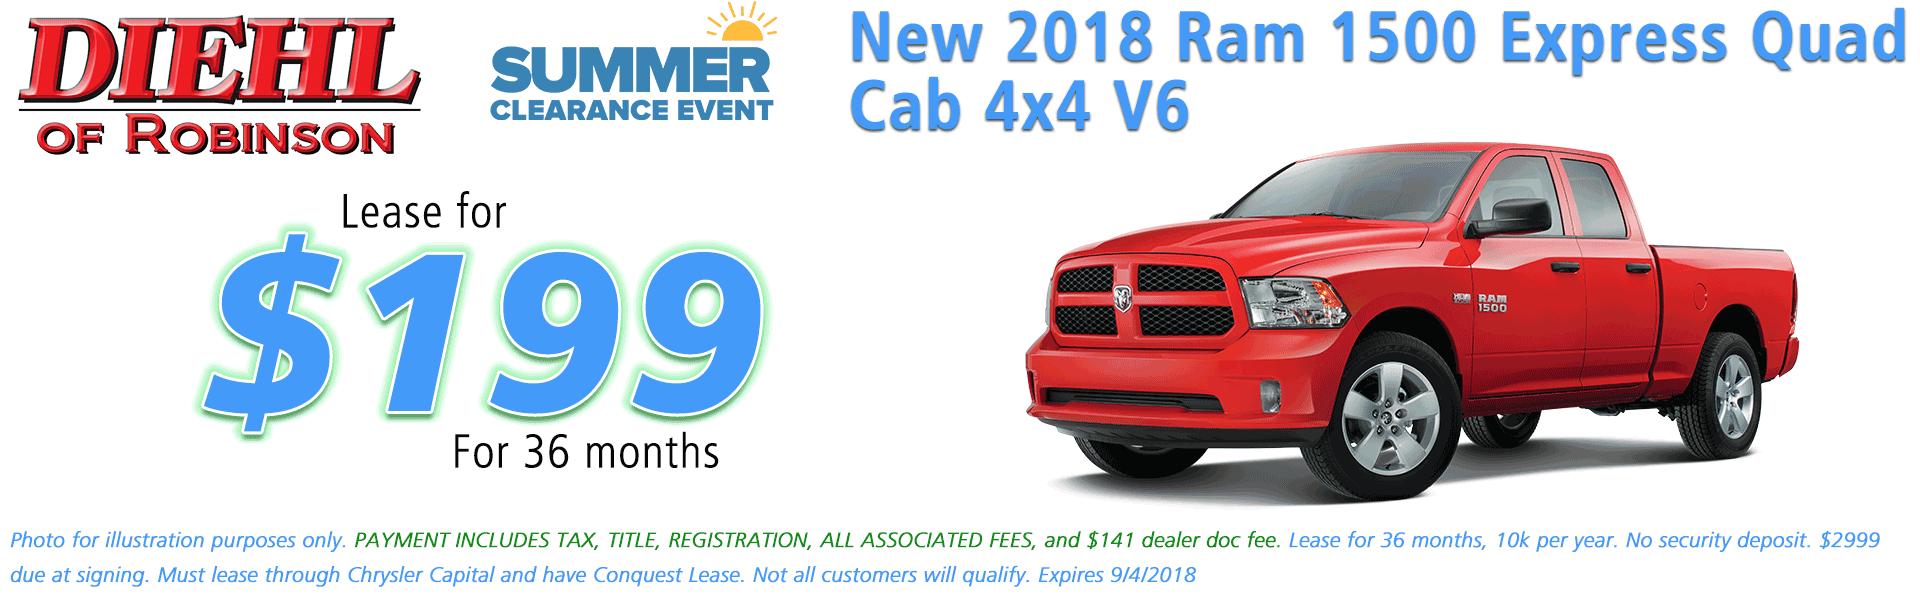 Diehl of Robinson Chrysler Dodge Jeep Ram Robinson Township PA 15136 NEW 2018 RAM 1500 EXPRESS QUAD CAB® 4X4 6'4